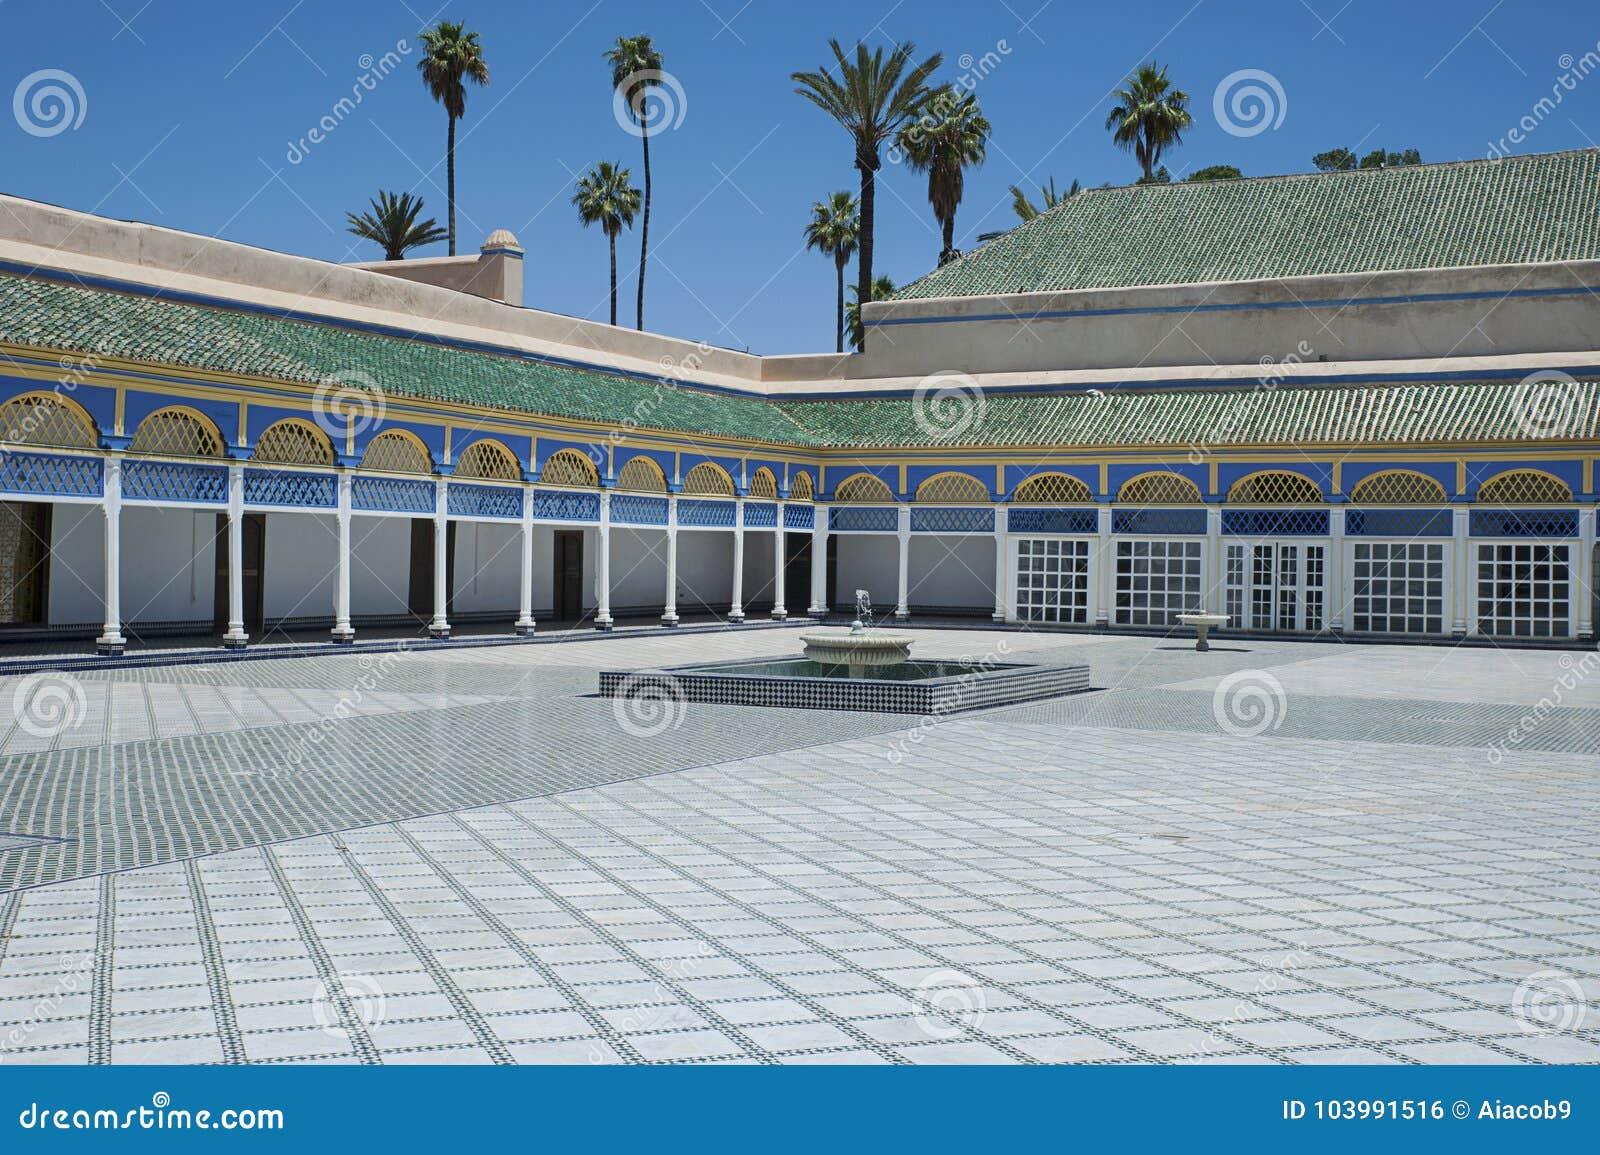 Bahia Palace, Marrakesh, Marocco - 8 maggio 2017